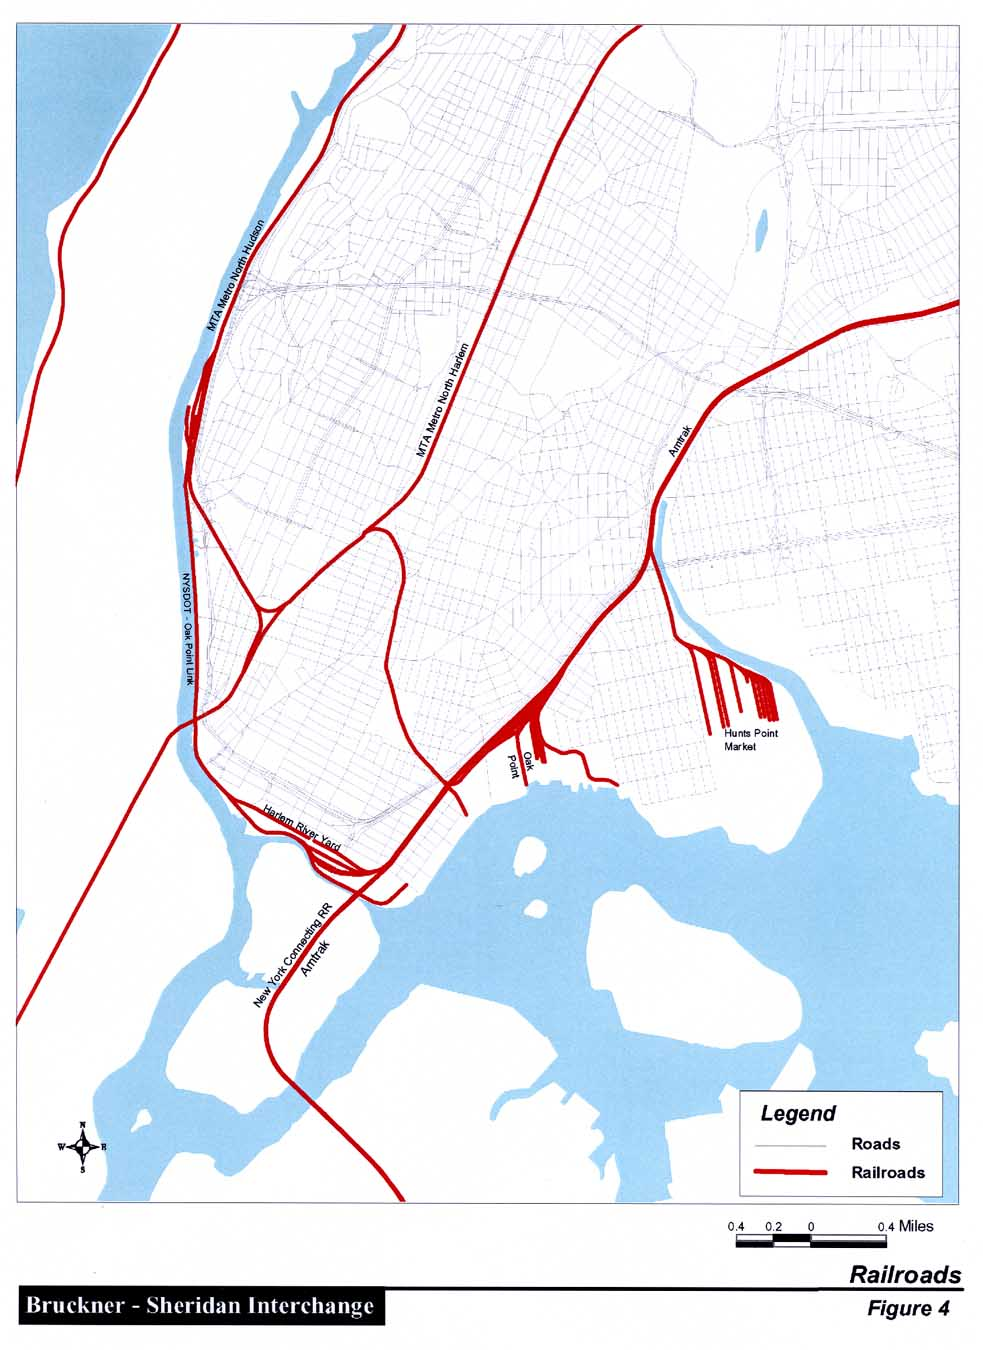 NYSDOT - Bronx - Bruckner Expressway - I278 - Sheridan